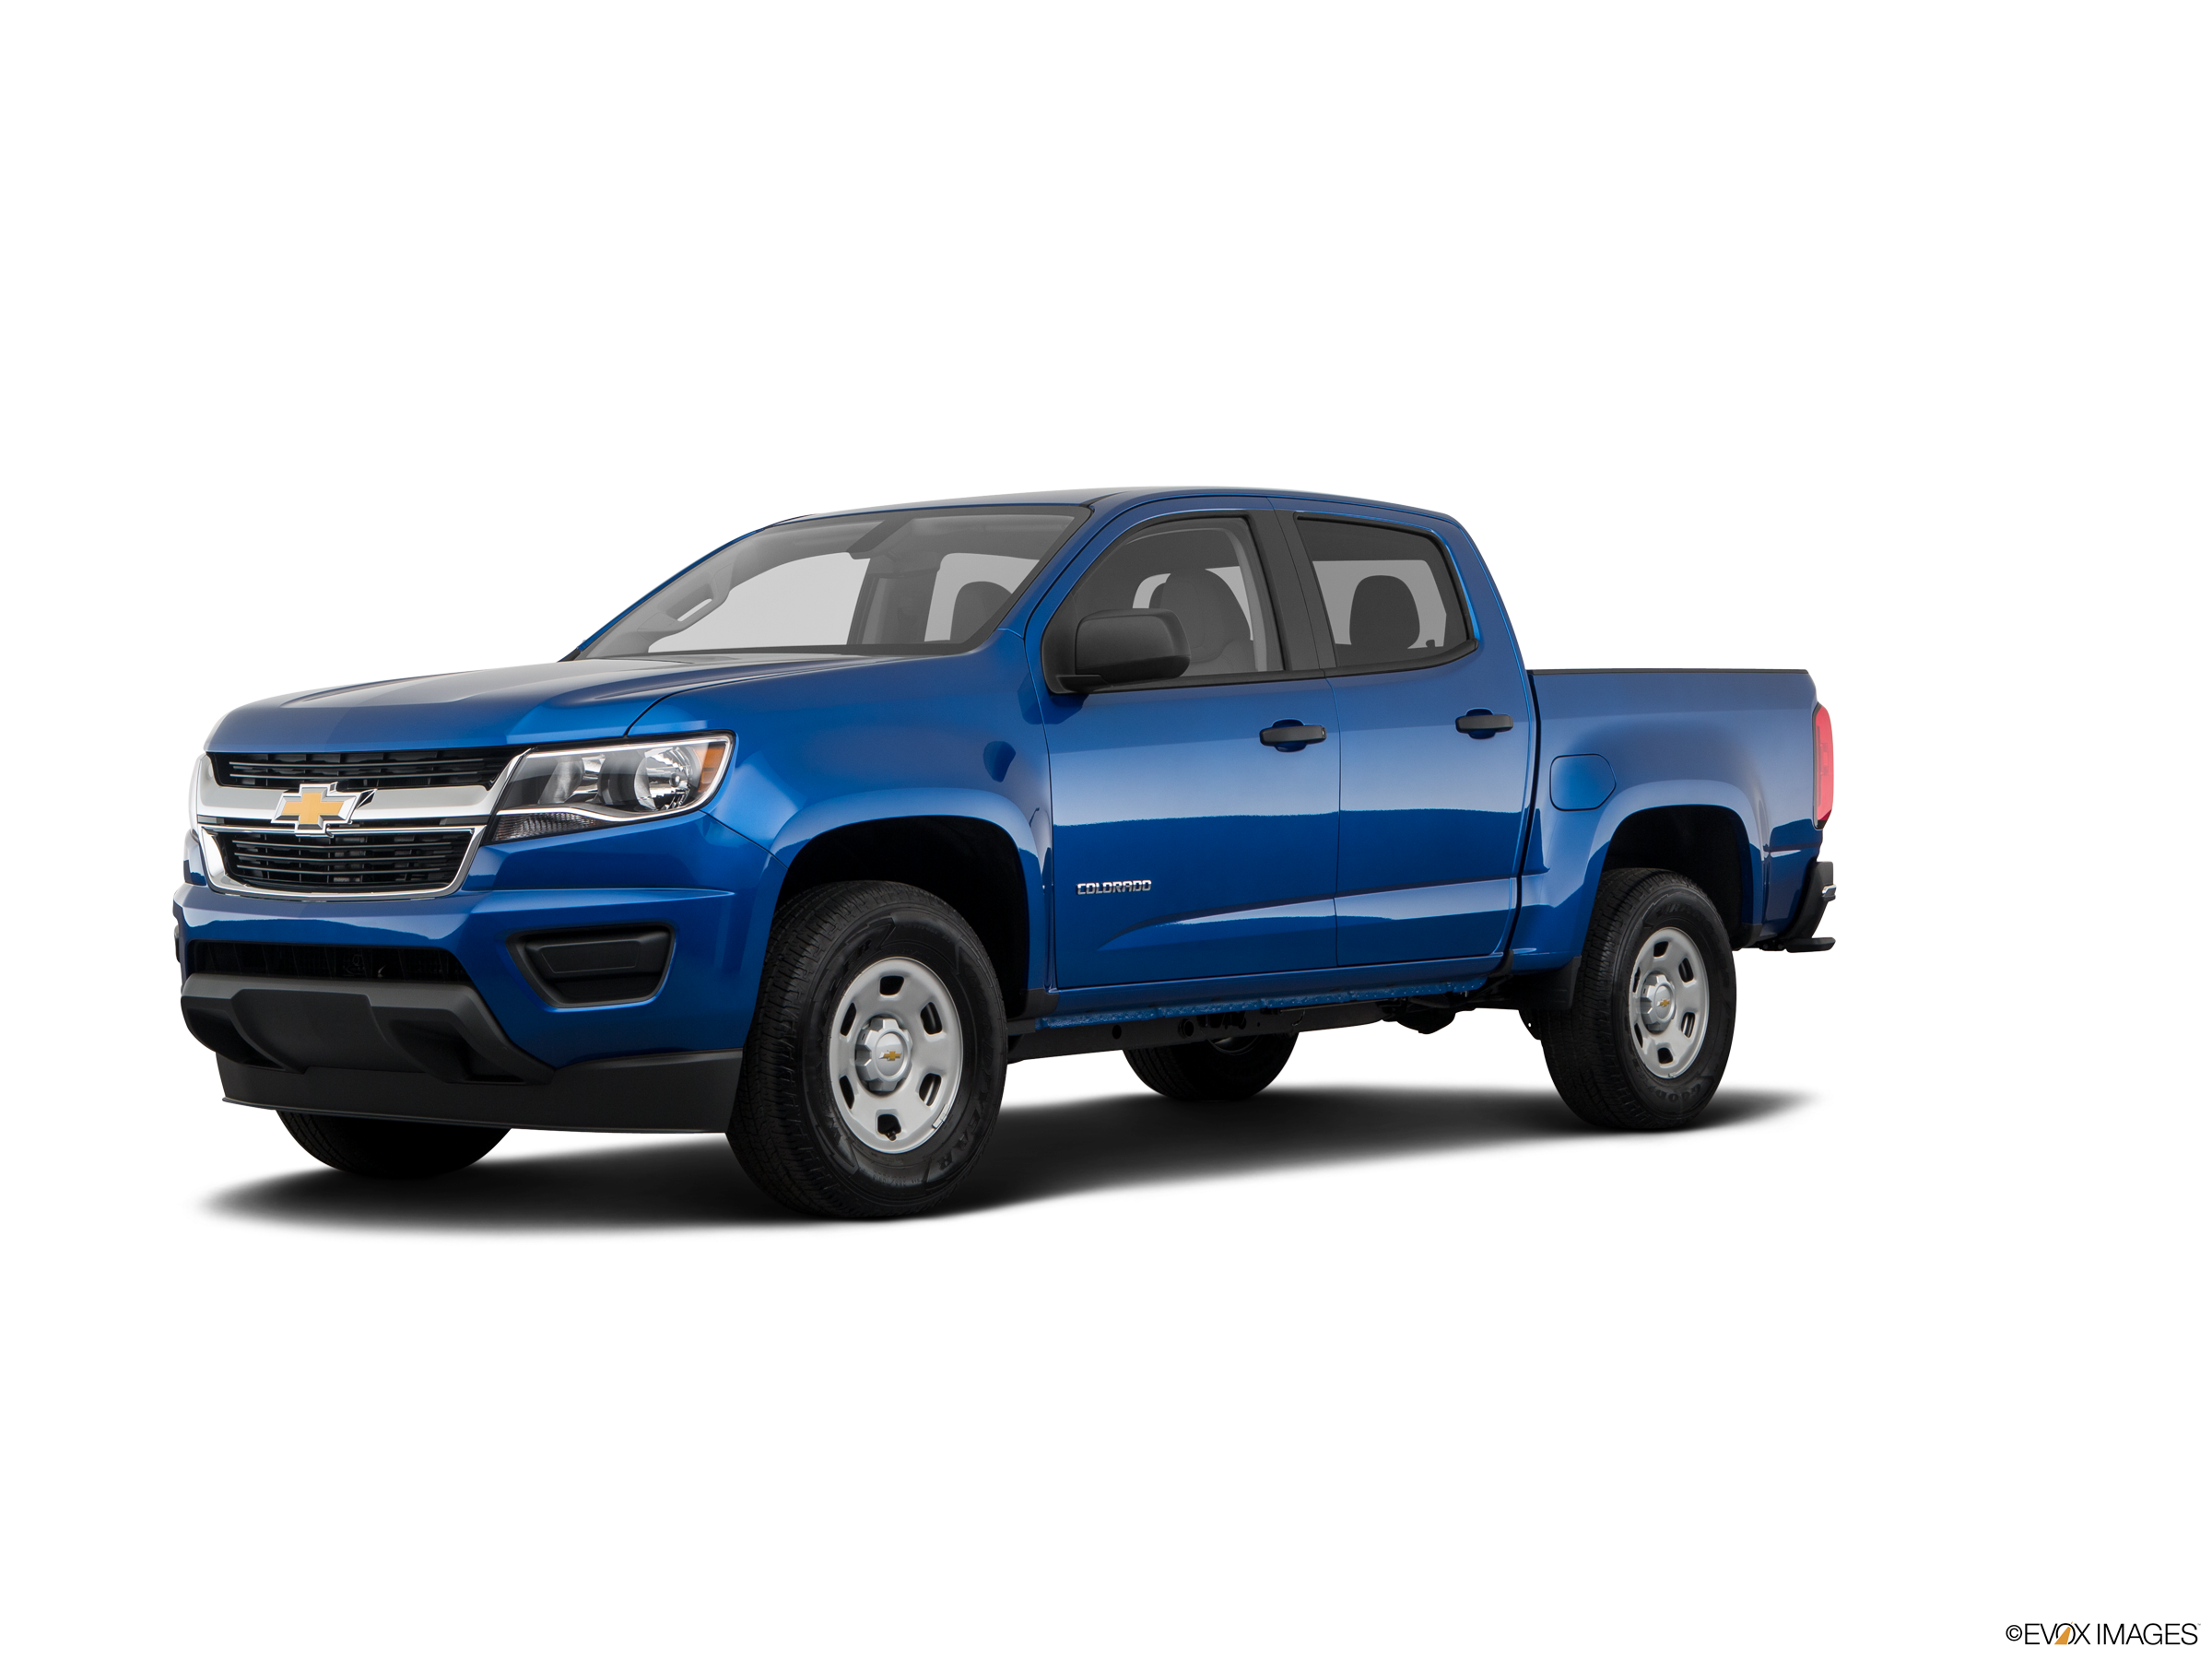 New 2020 Chevrolet Colorado Crew Cab Lt Prices Kelley Blue Book